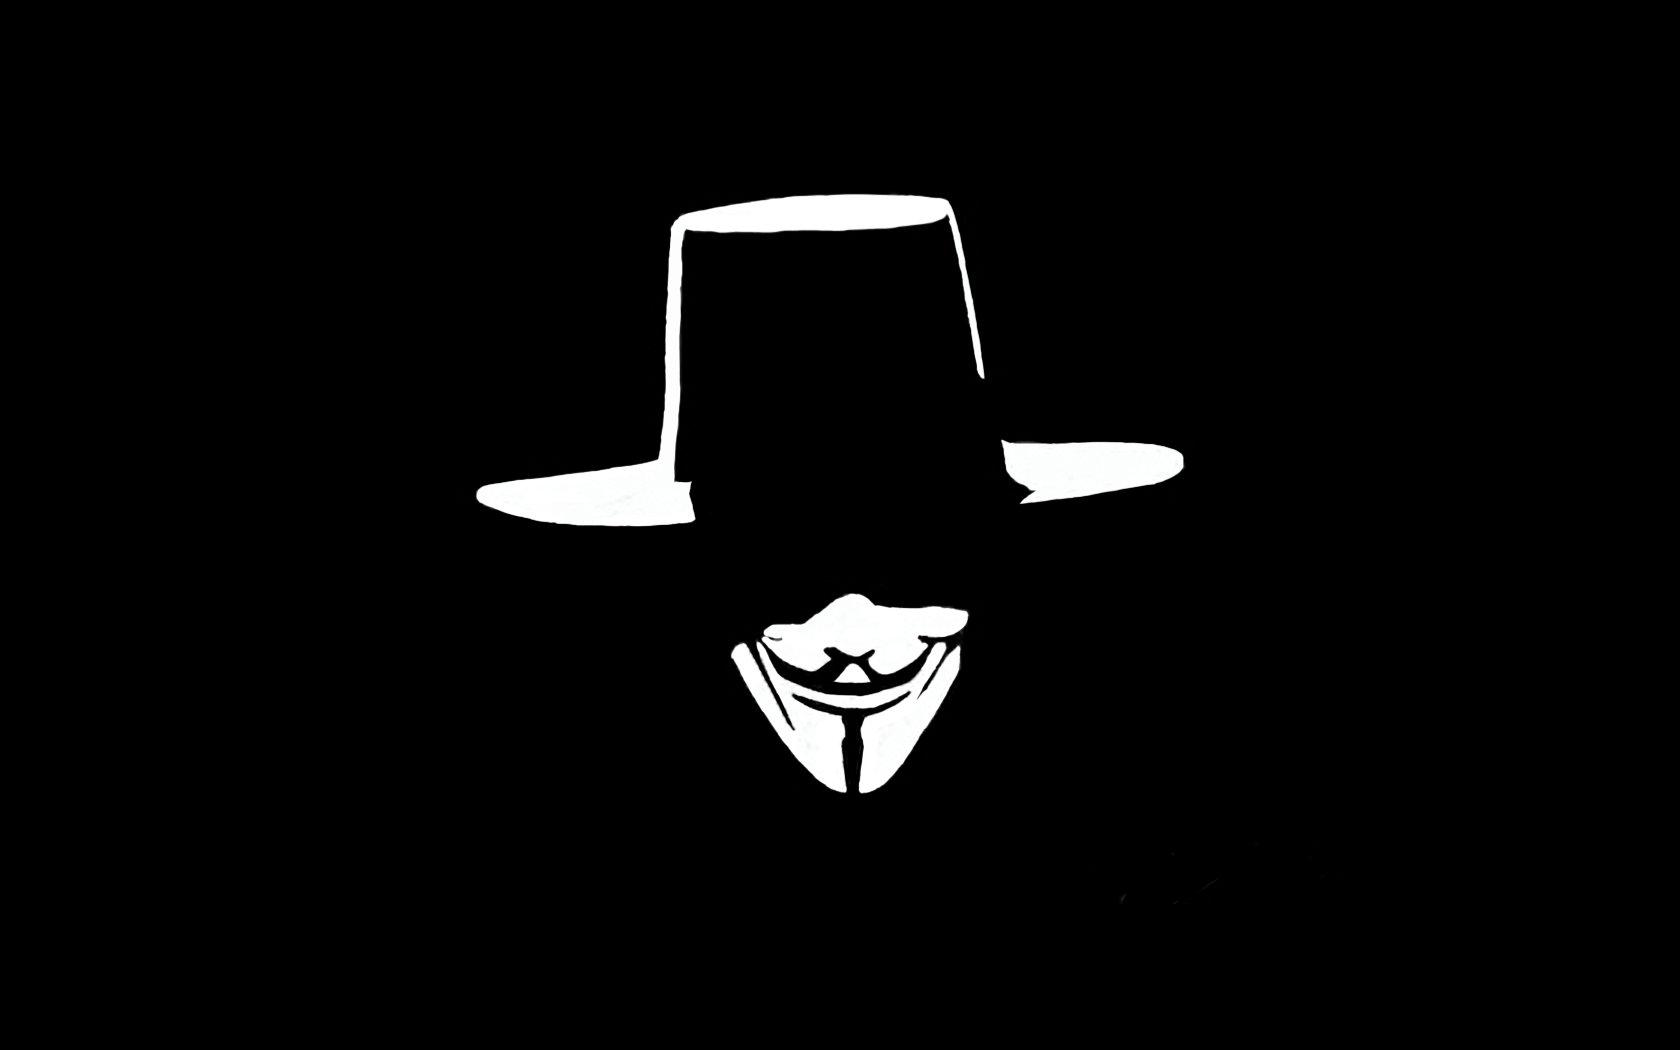 Anonymous V Wallpaper 1680x1050 Anonymous V For Vendetta 1680x1050